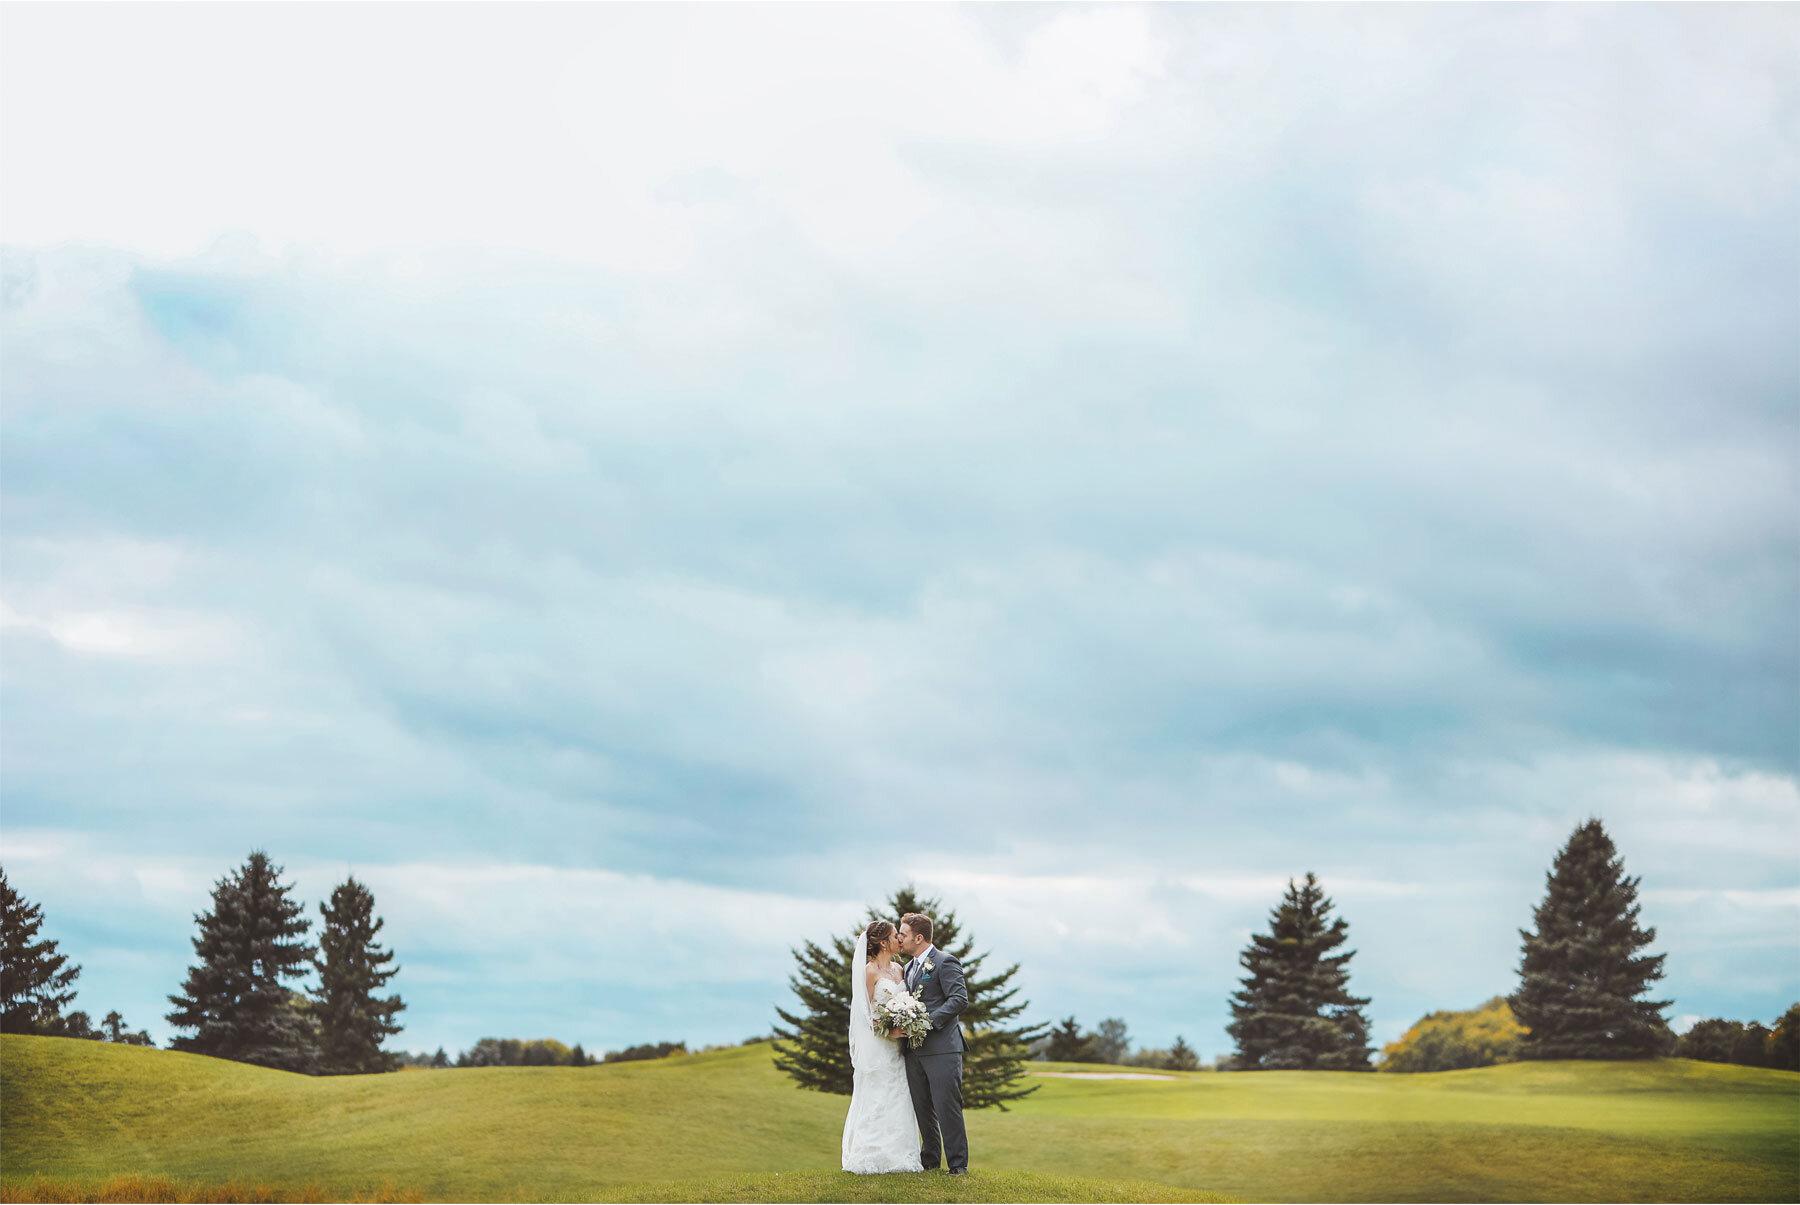 15-Vick-Photography-Minneapolis-Minnesota-Wedding-Rush-Creek-Golf-Club-Groom-Amanda-and-Michael.jpg